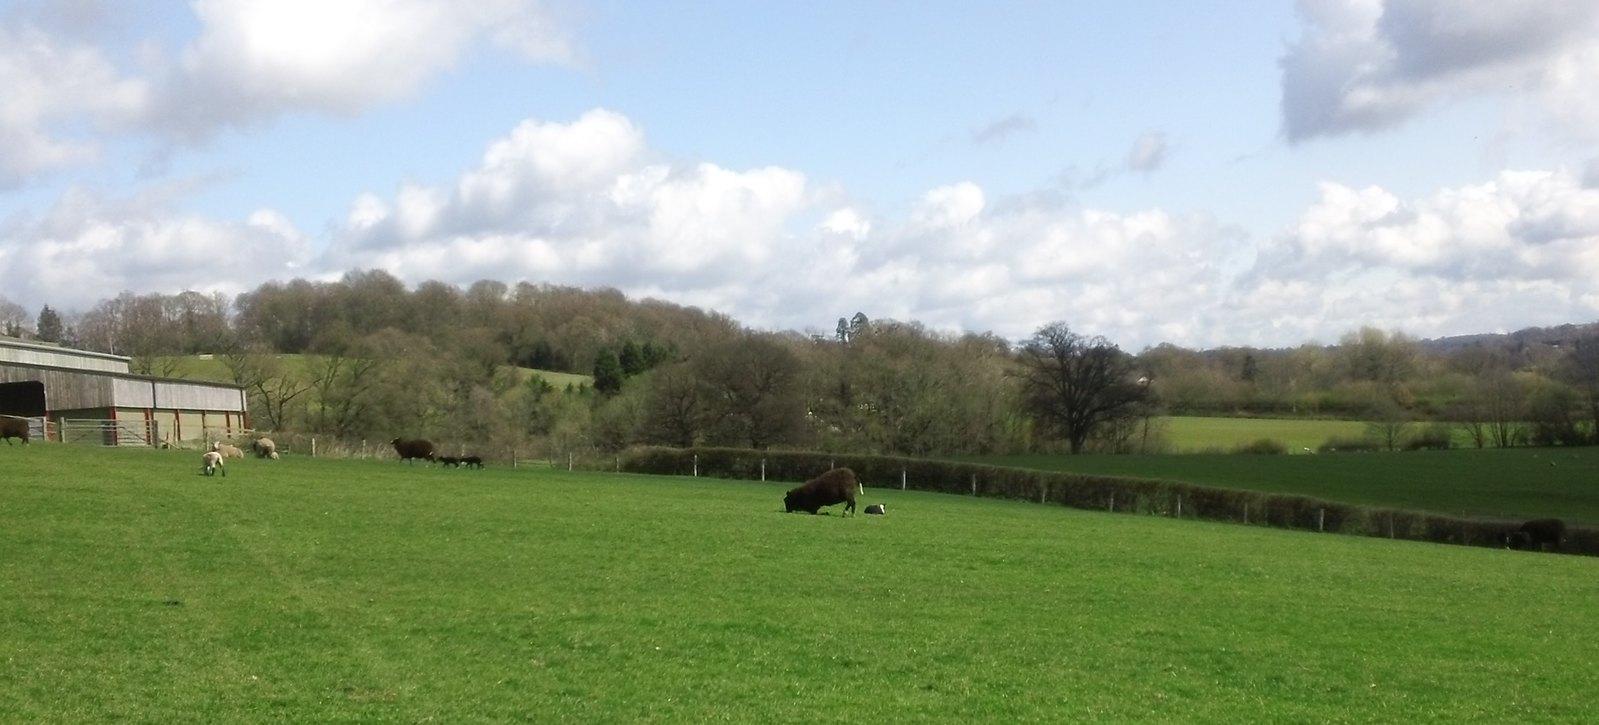 Yes, it's a kneeling black sheep